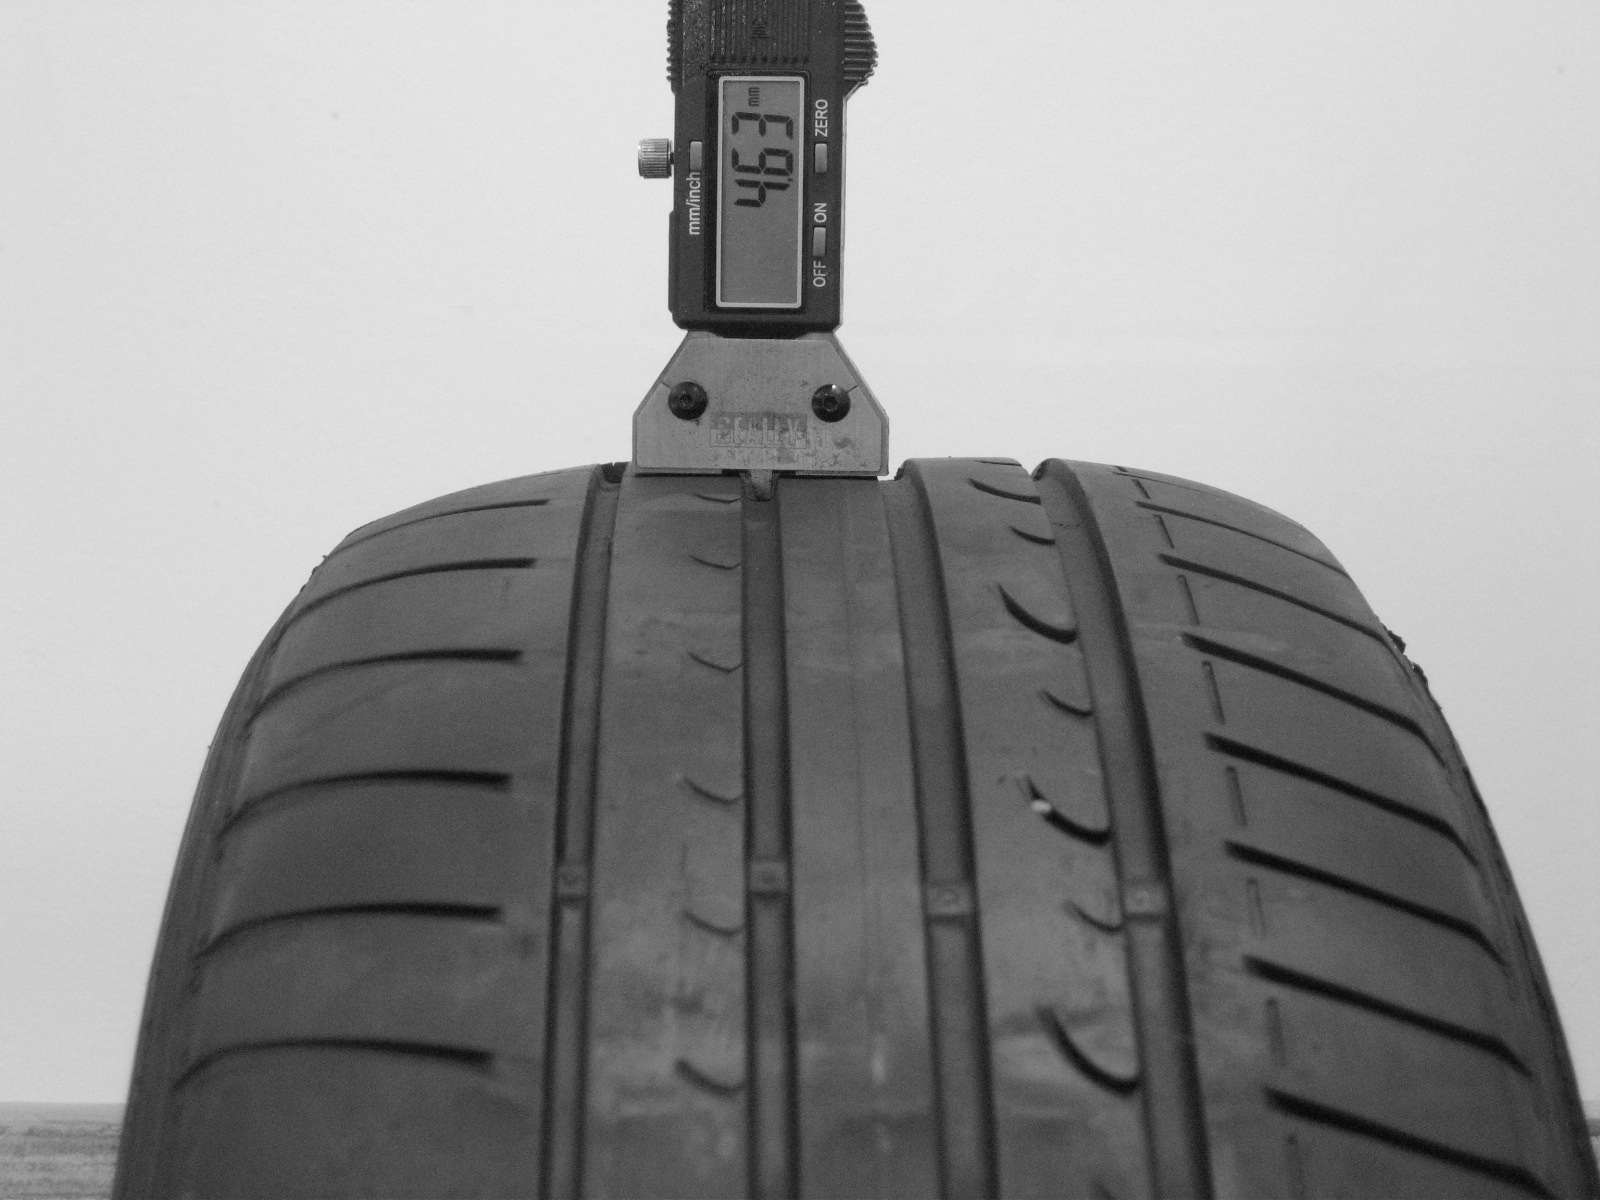 Použité-Pneu-Bazar - 205/60 R15 DUNLOP SP SPORT FASTRESPONSE -kusovka-rezerva 3mm